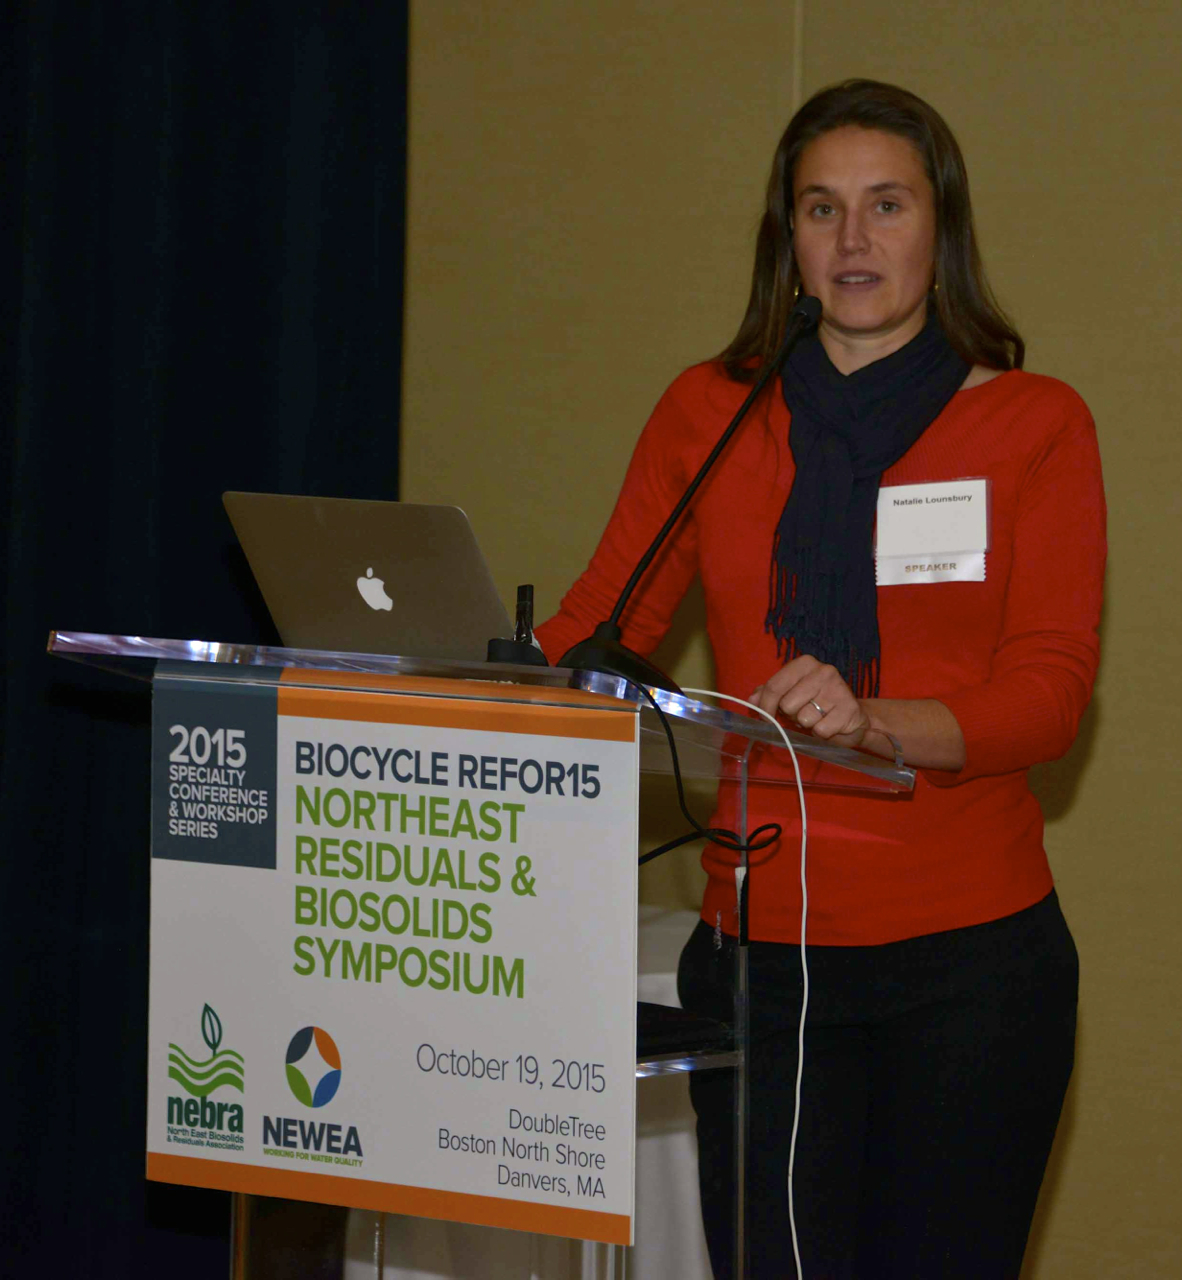 Keynote speaker Natalie Lounsbury.  C. Tyler photo.